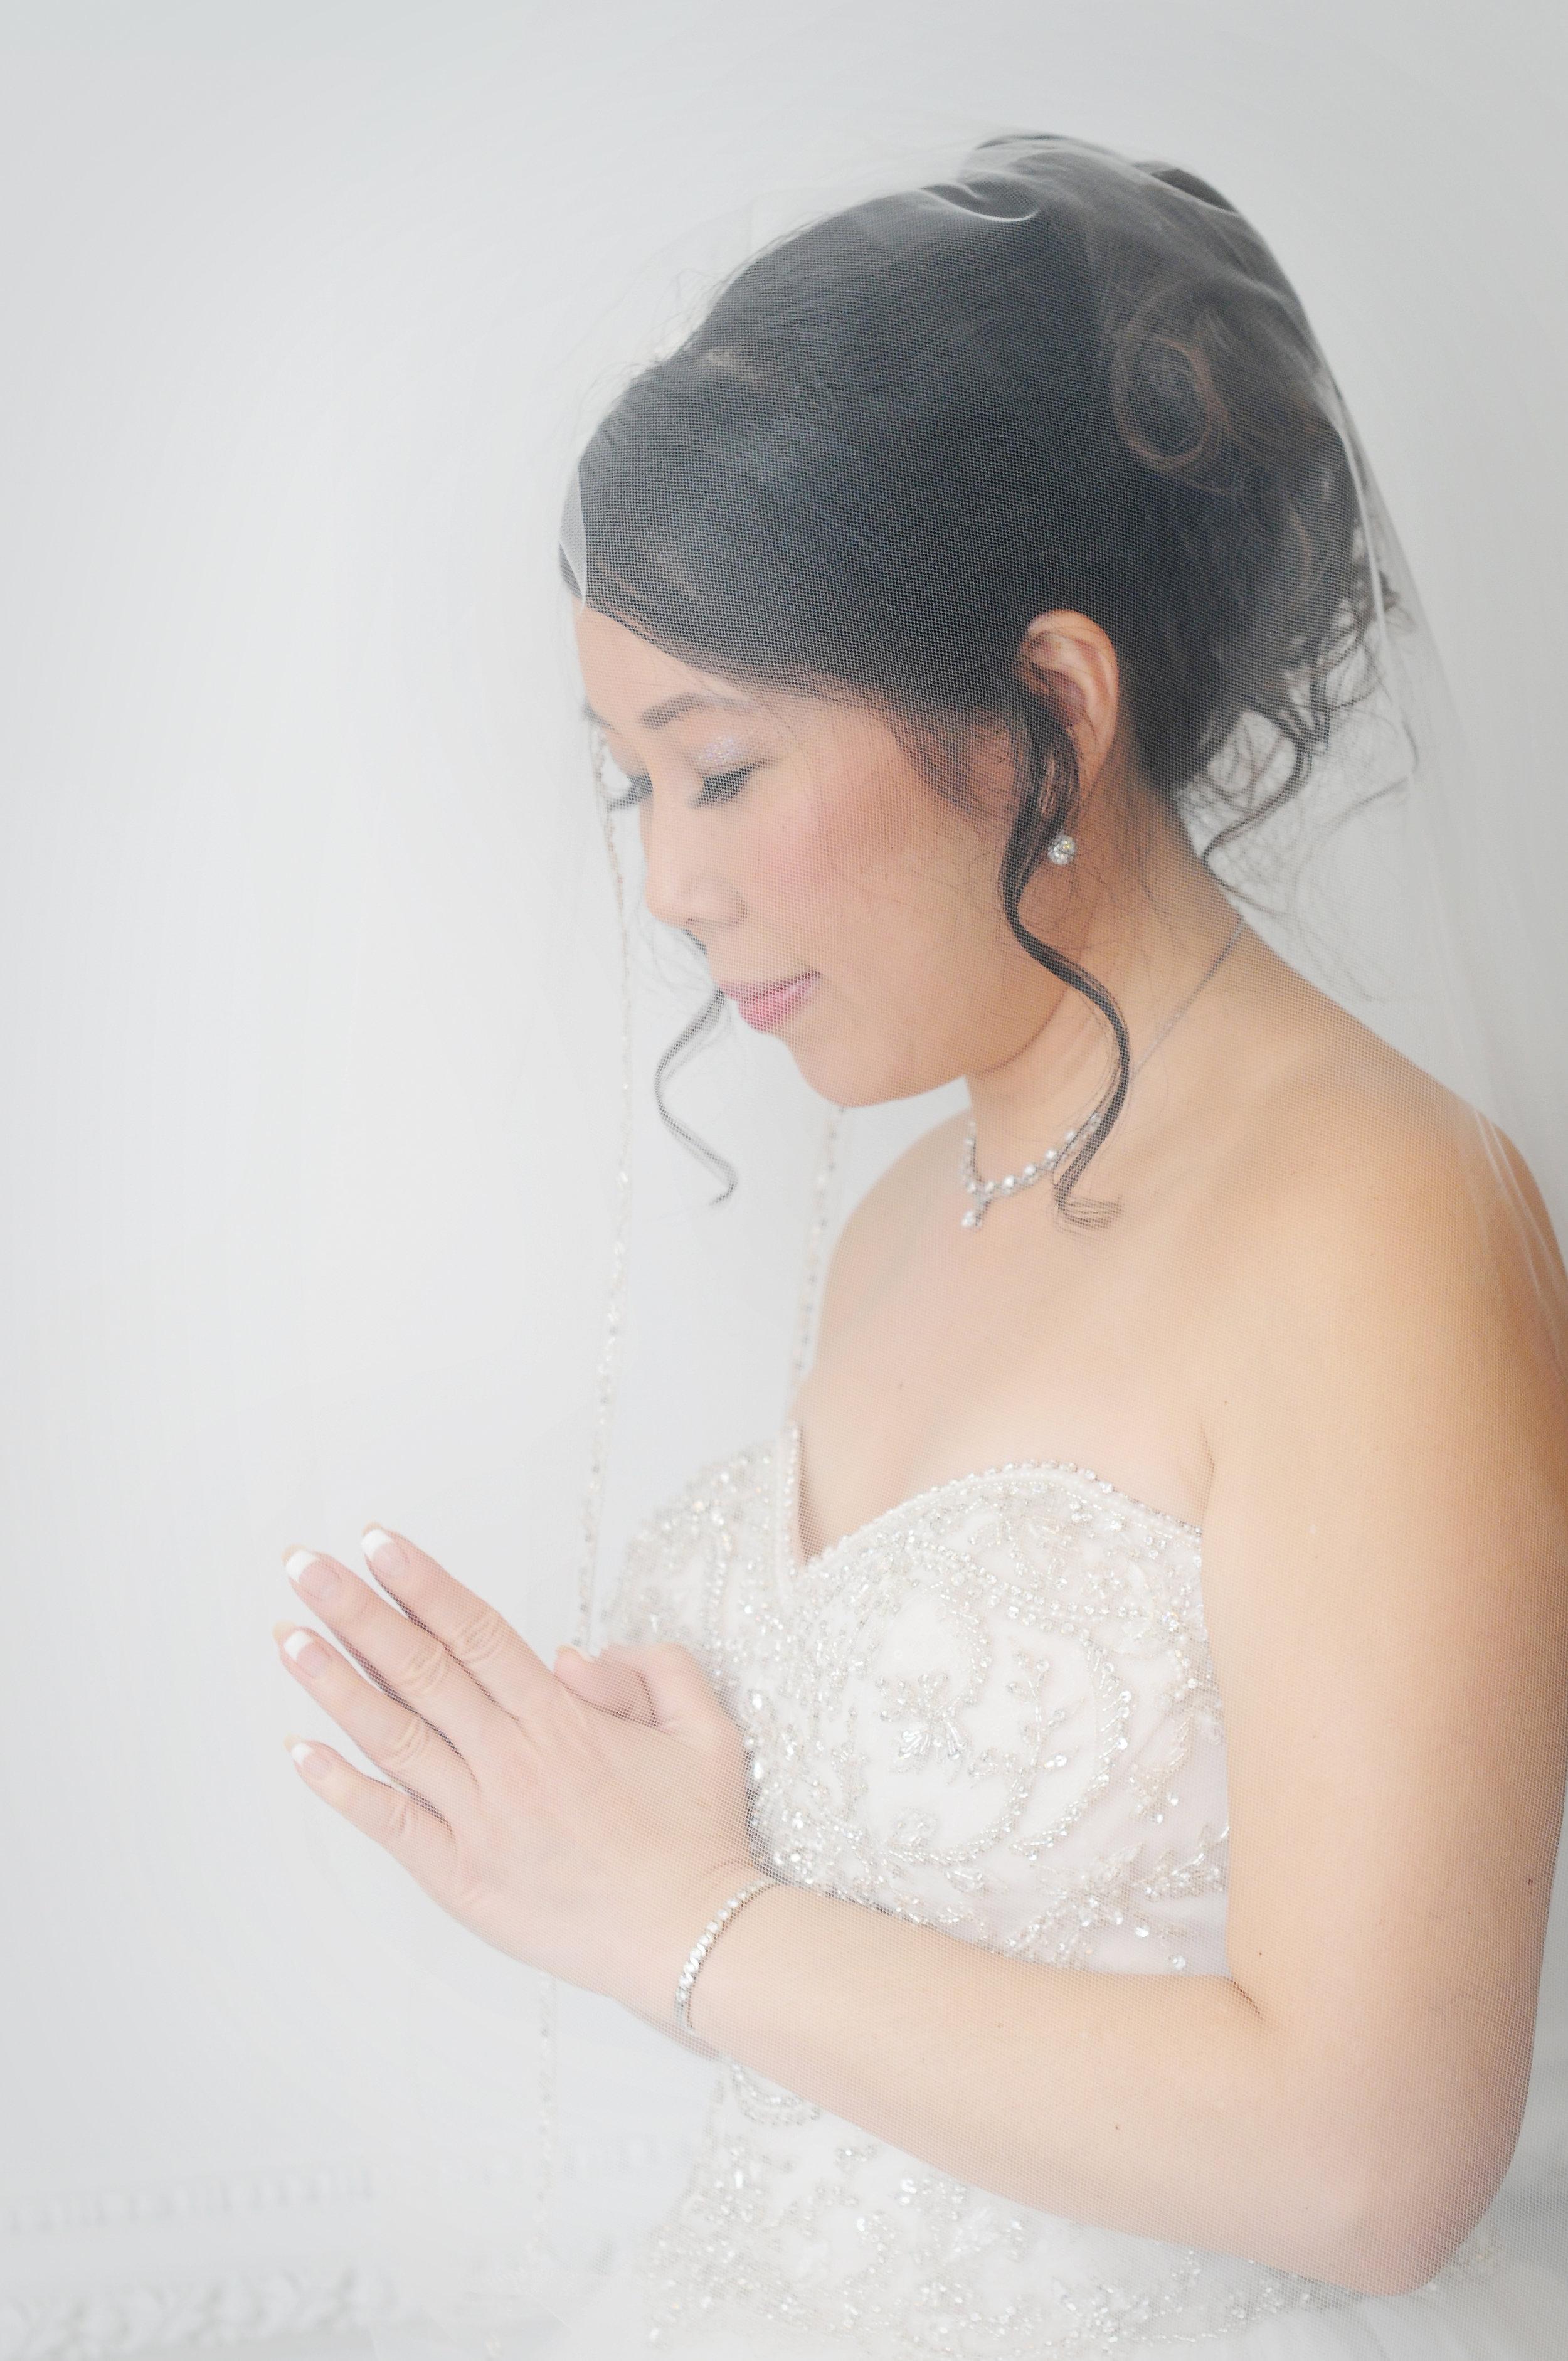 Partovi Wedding 2166 by maria pablo.jpg